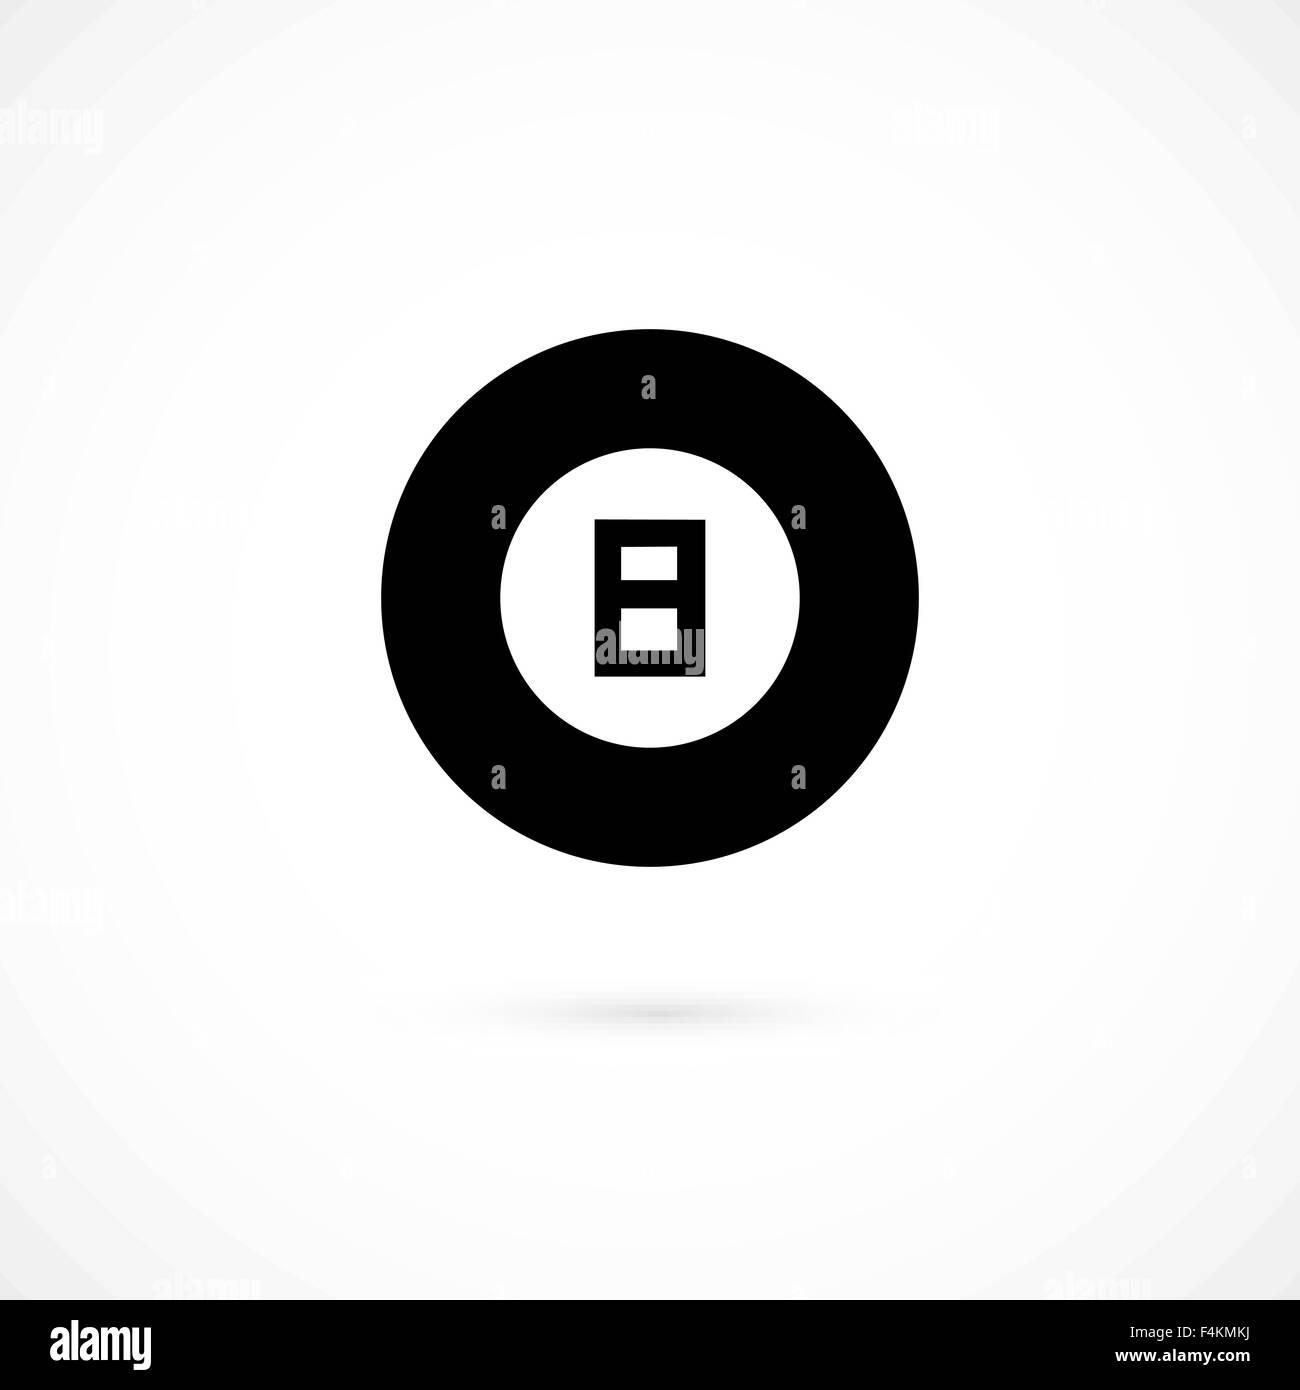 Billiard icon isolated on white background - Stock Image